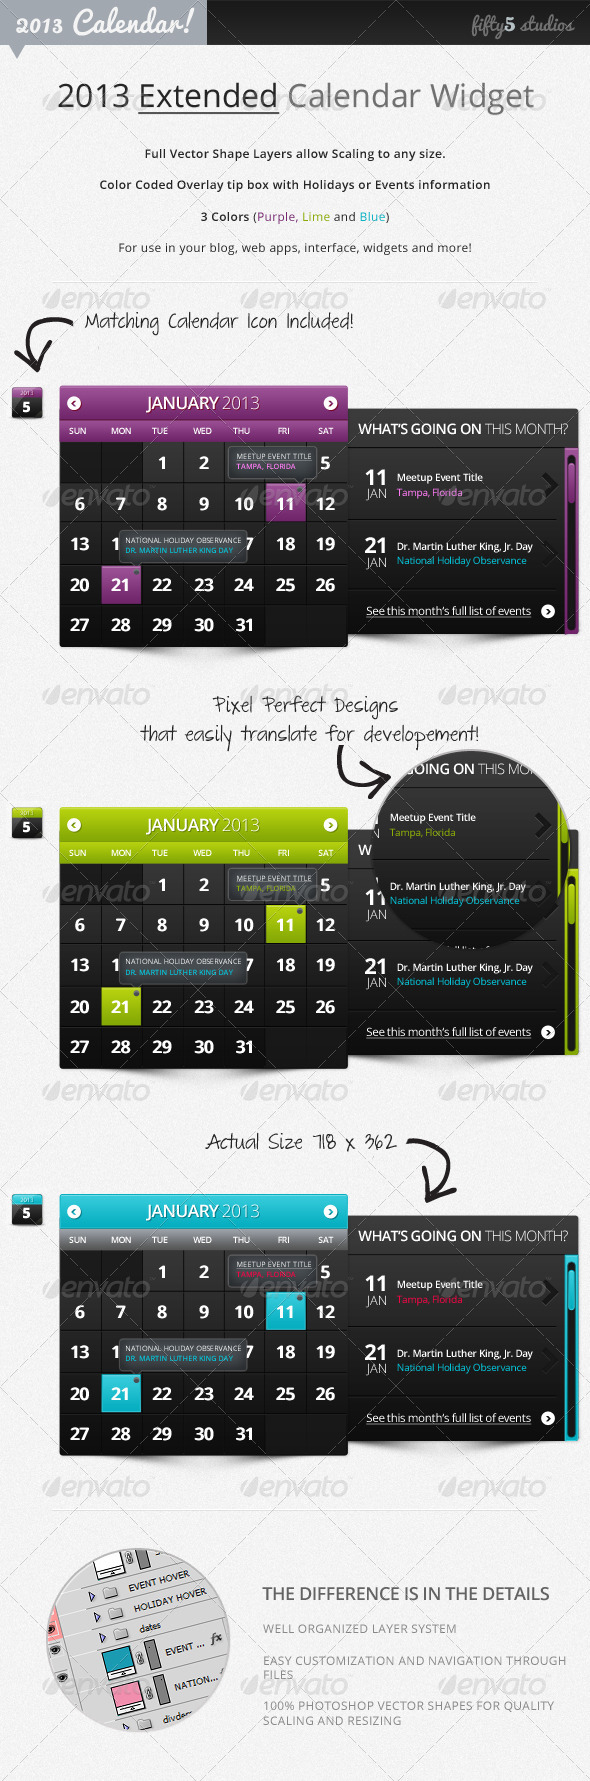 2013 (Extended) Calendar Widget v2.0 - Miscellaneous Web Elements